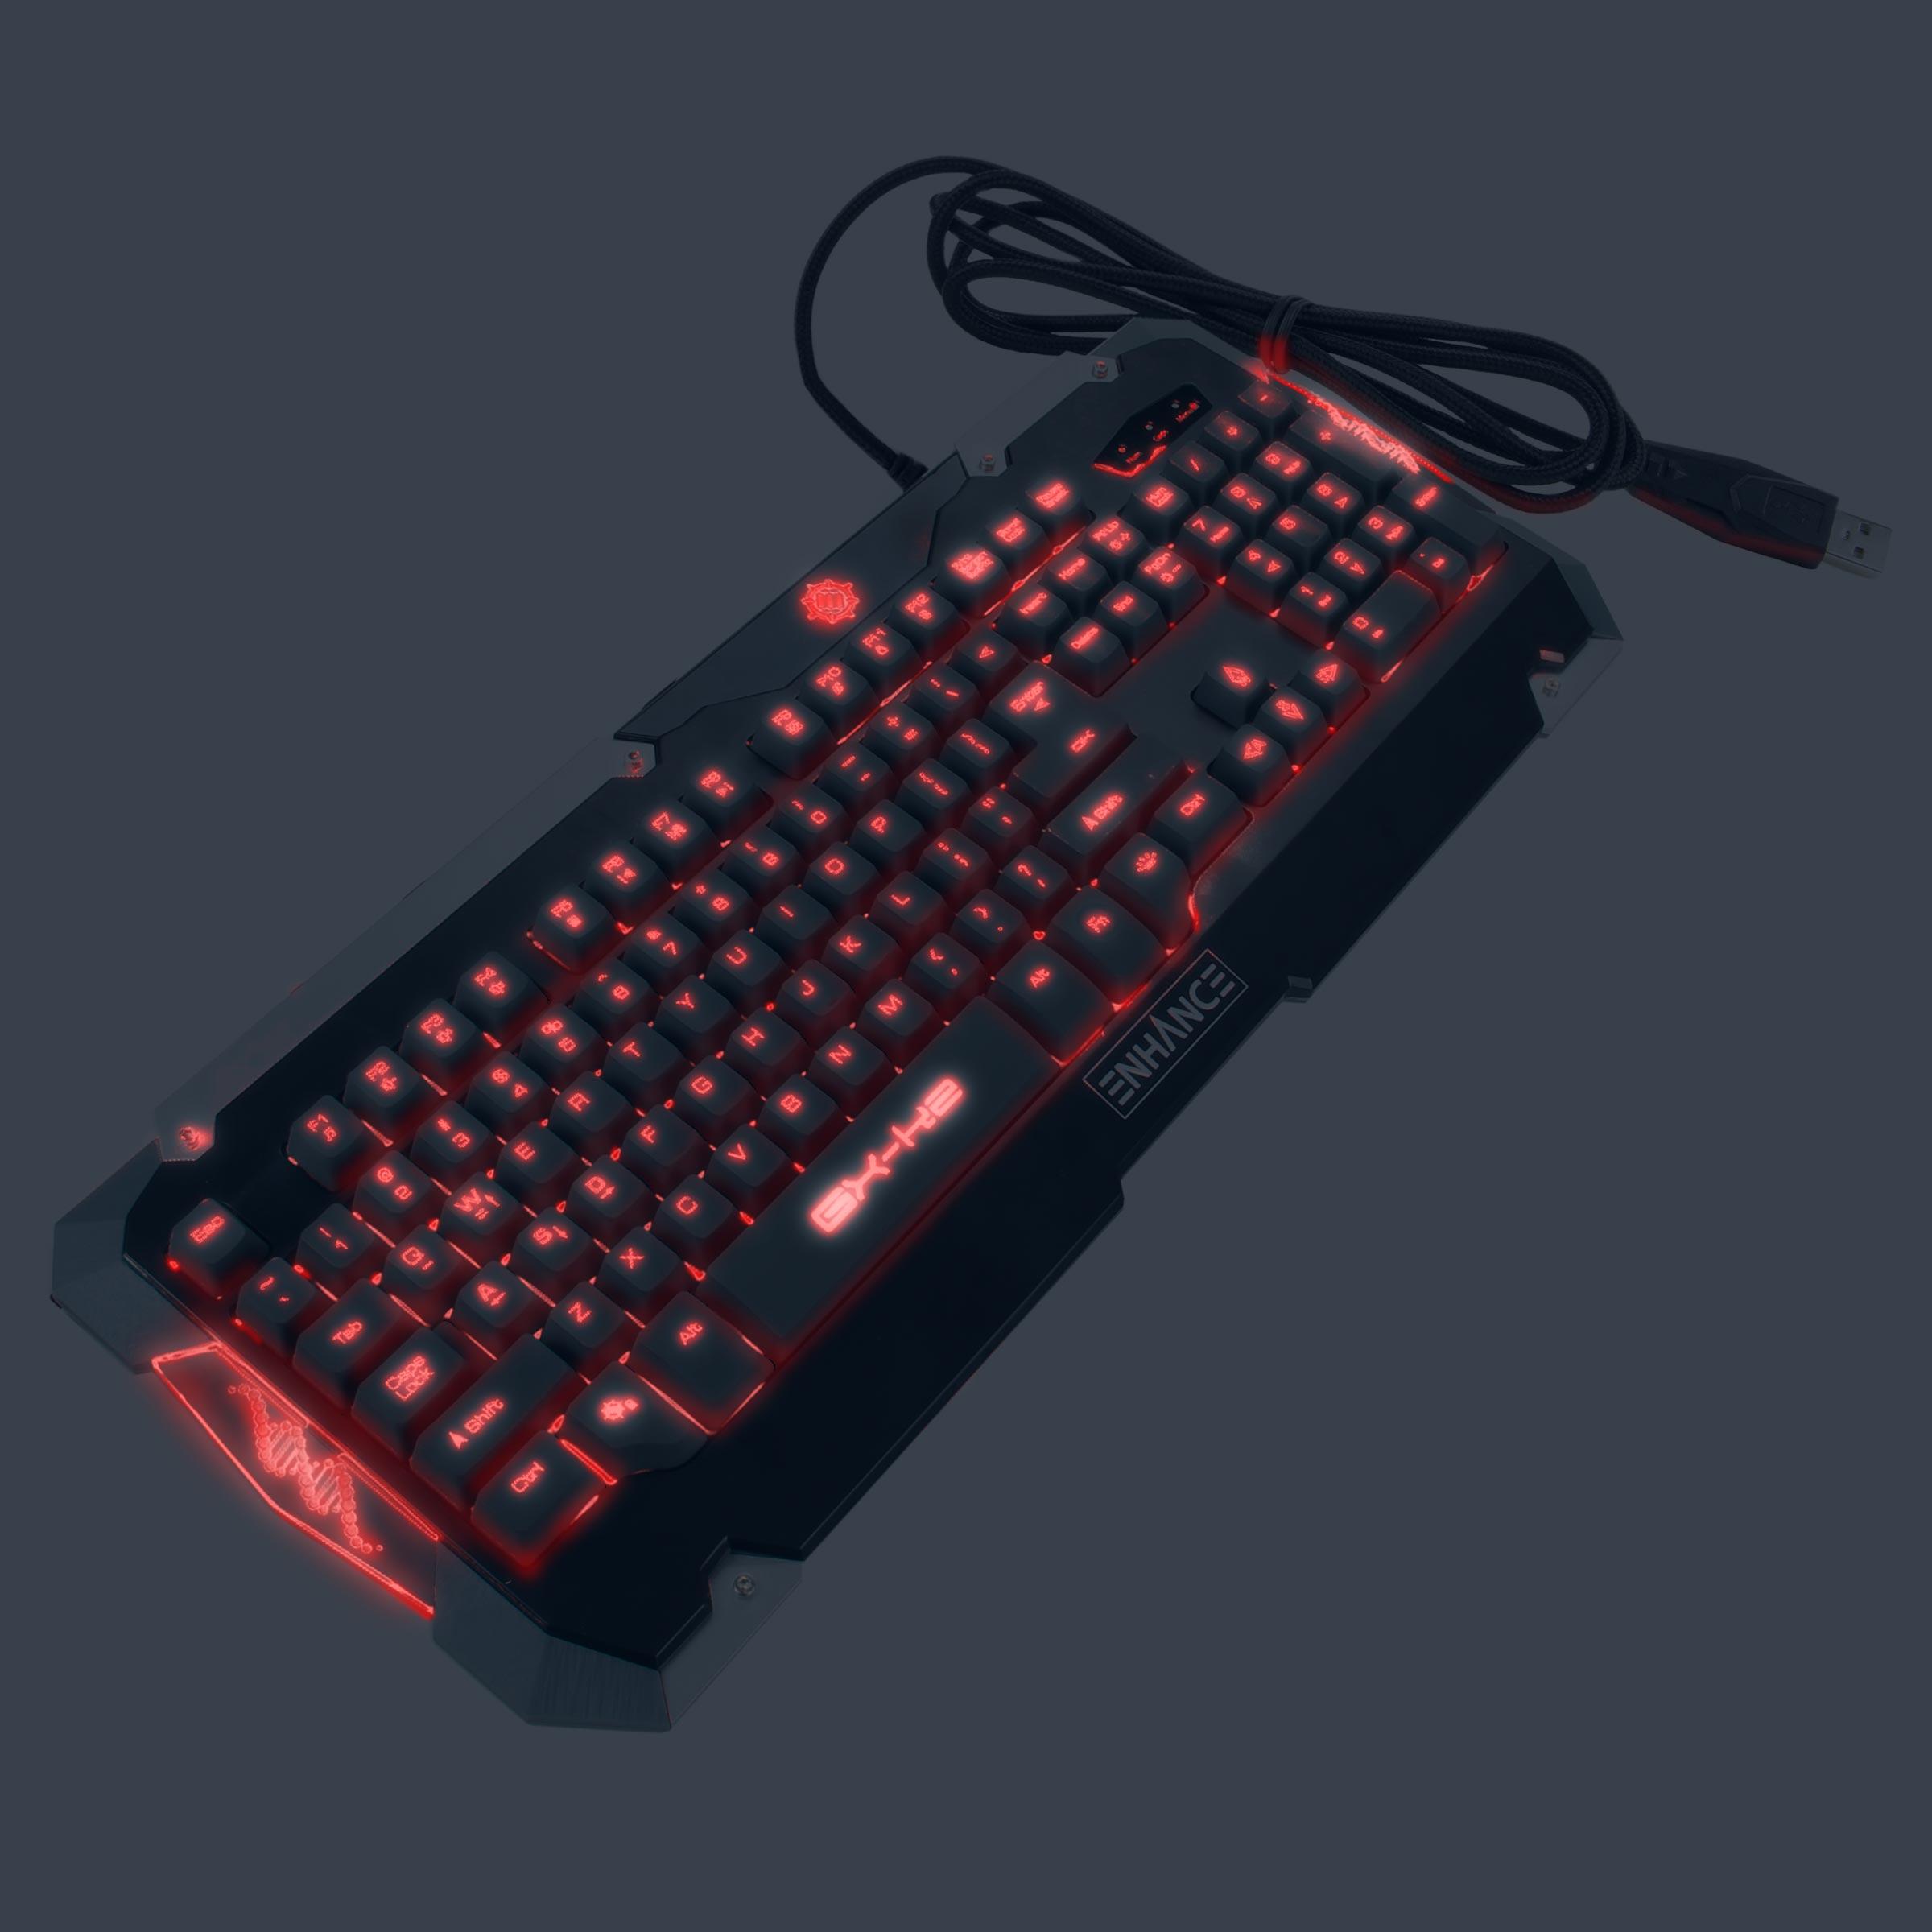 ENHANCE GX-K2 LED Gaming Keyboard with Hybrid Switches , 104+ Keys & 3 Switchable Backlight Colors 7